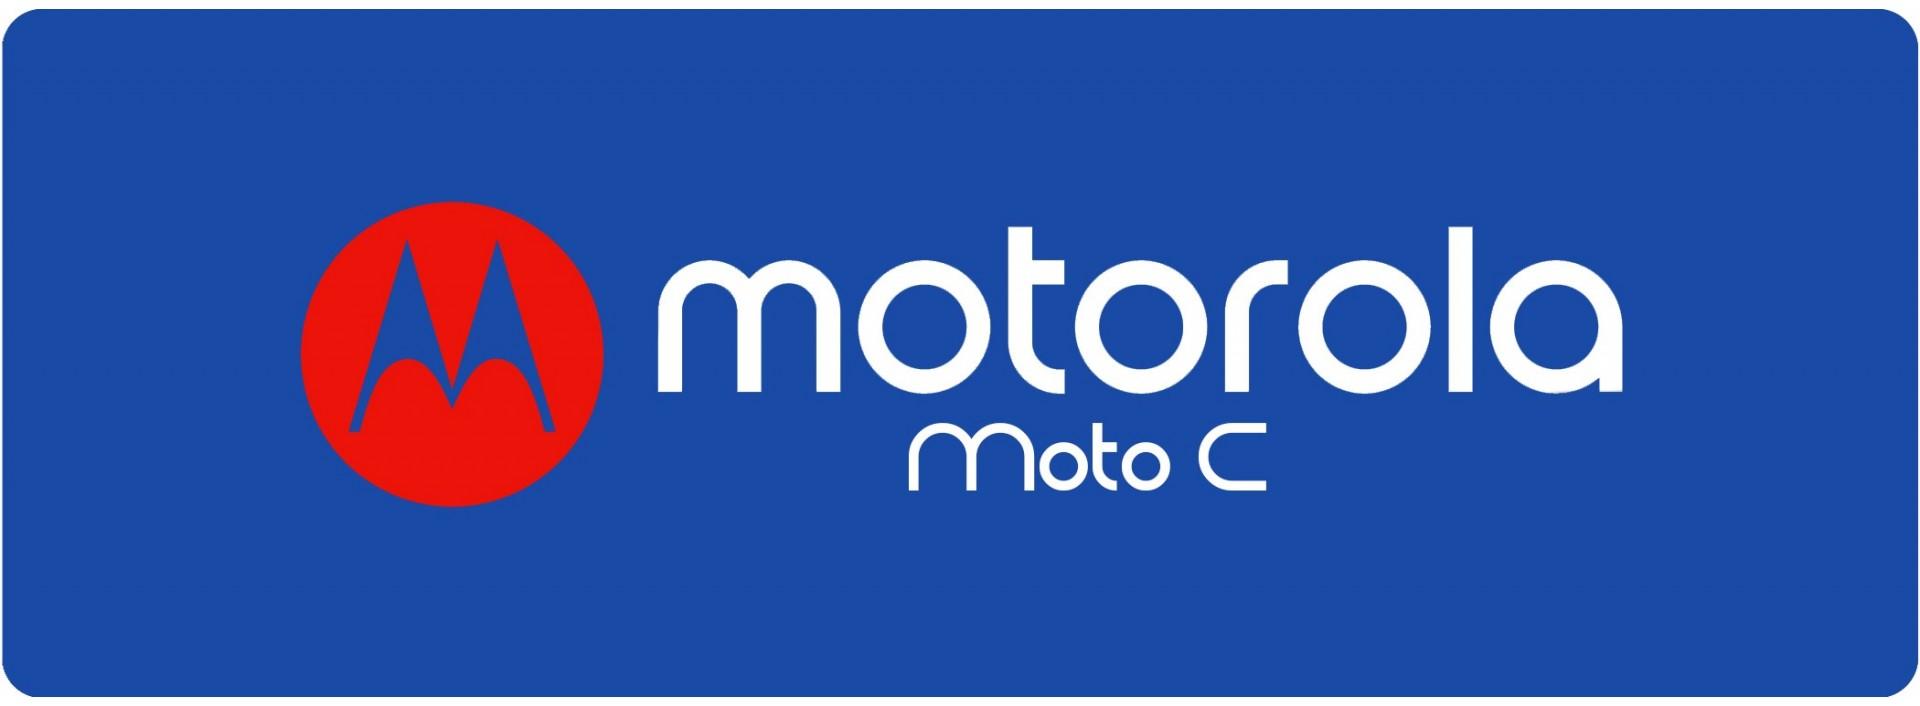 Fundas para Motorola Familia Moto C